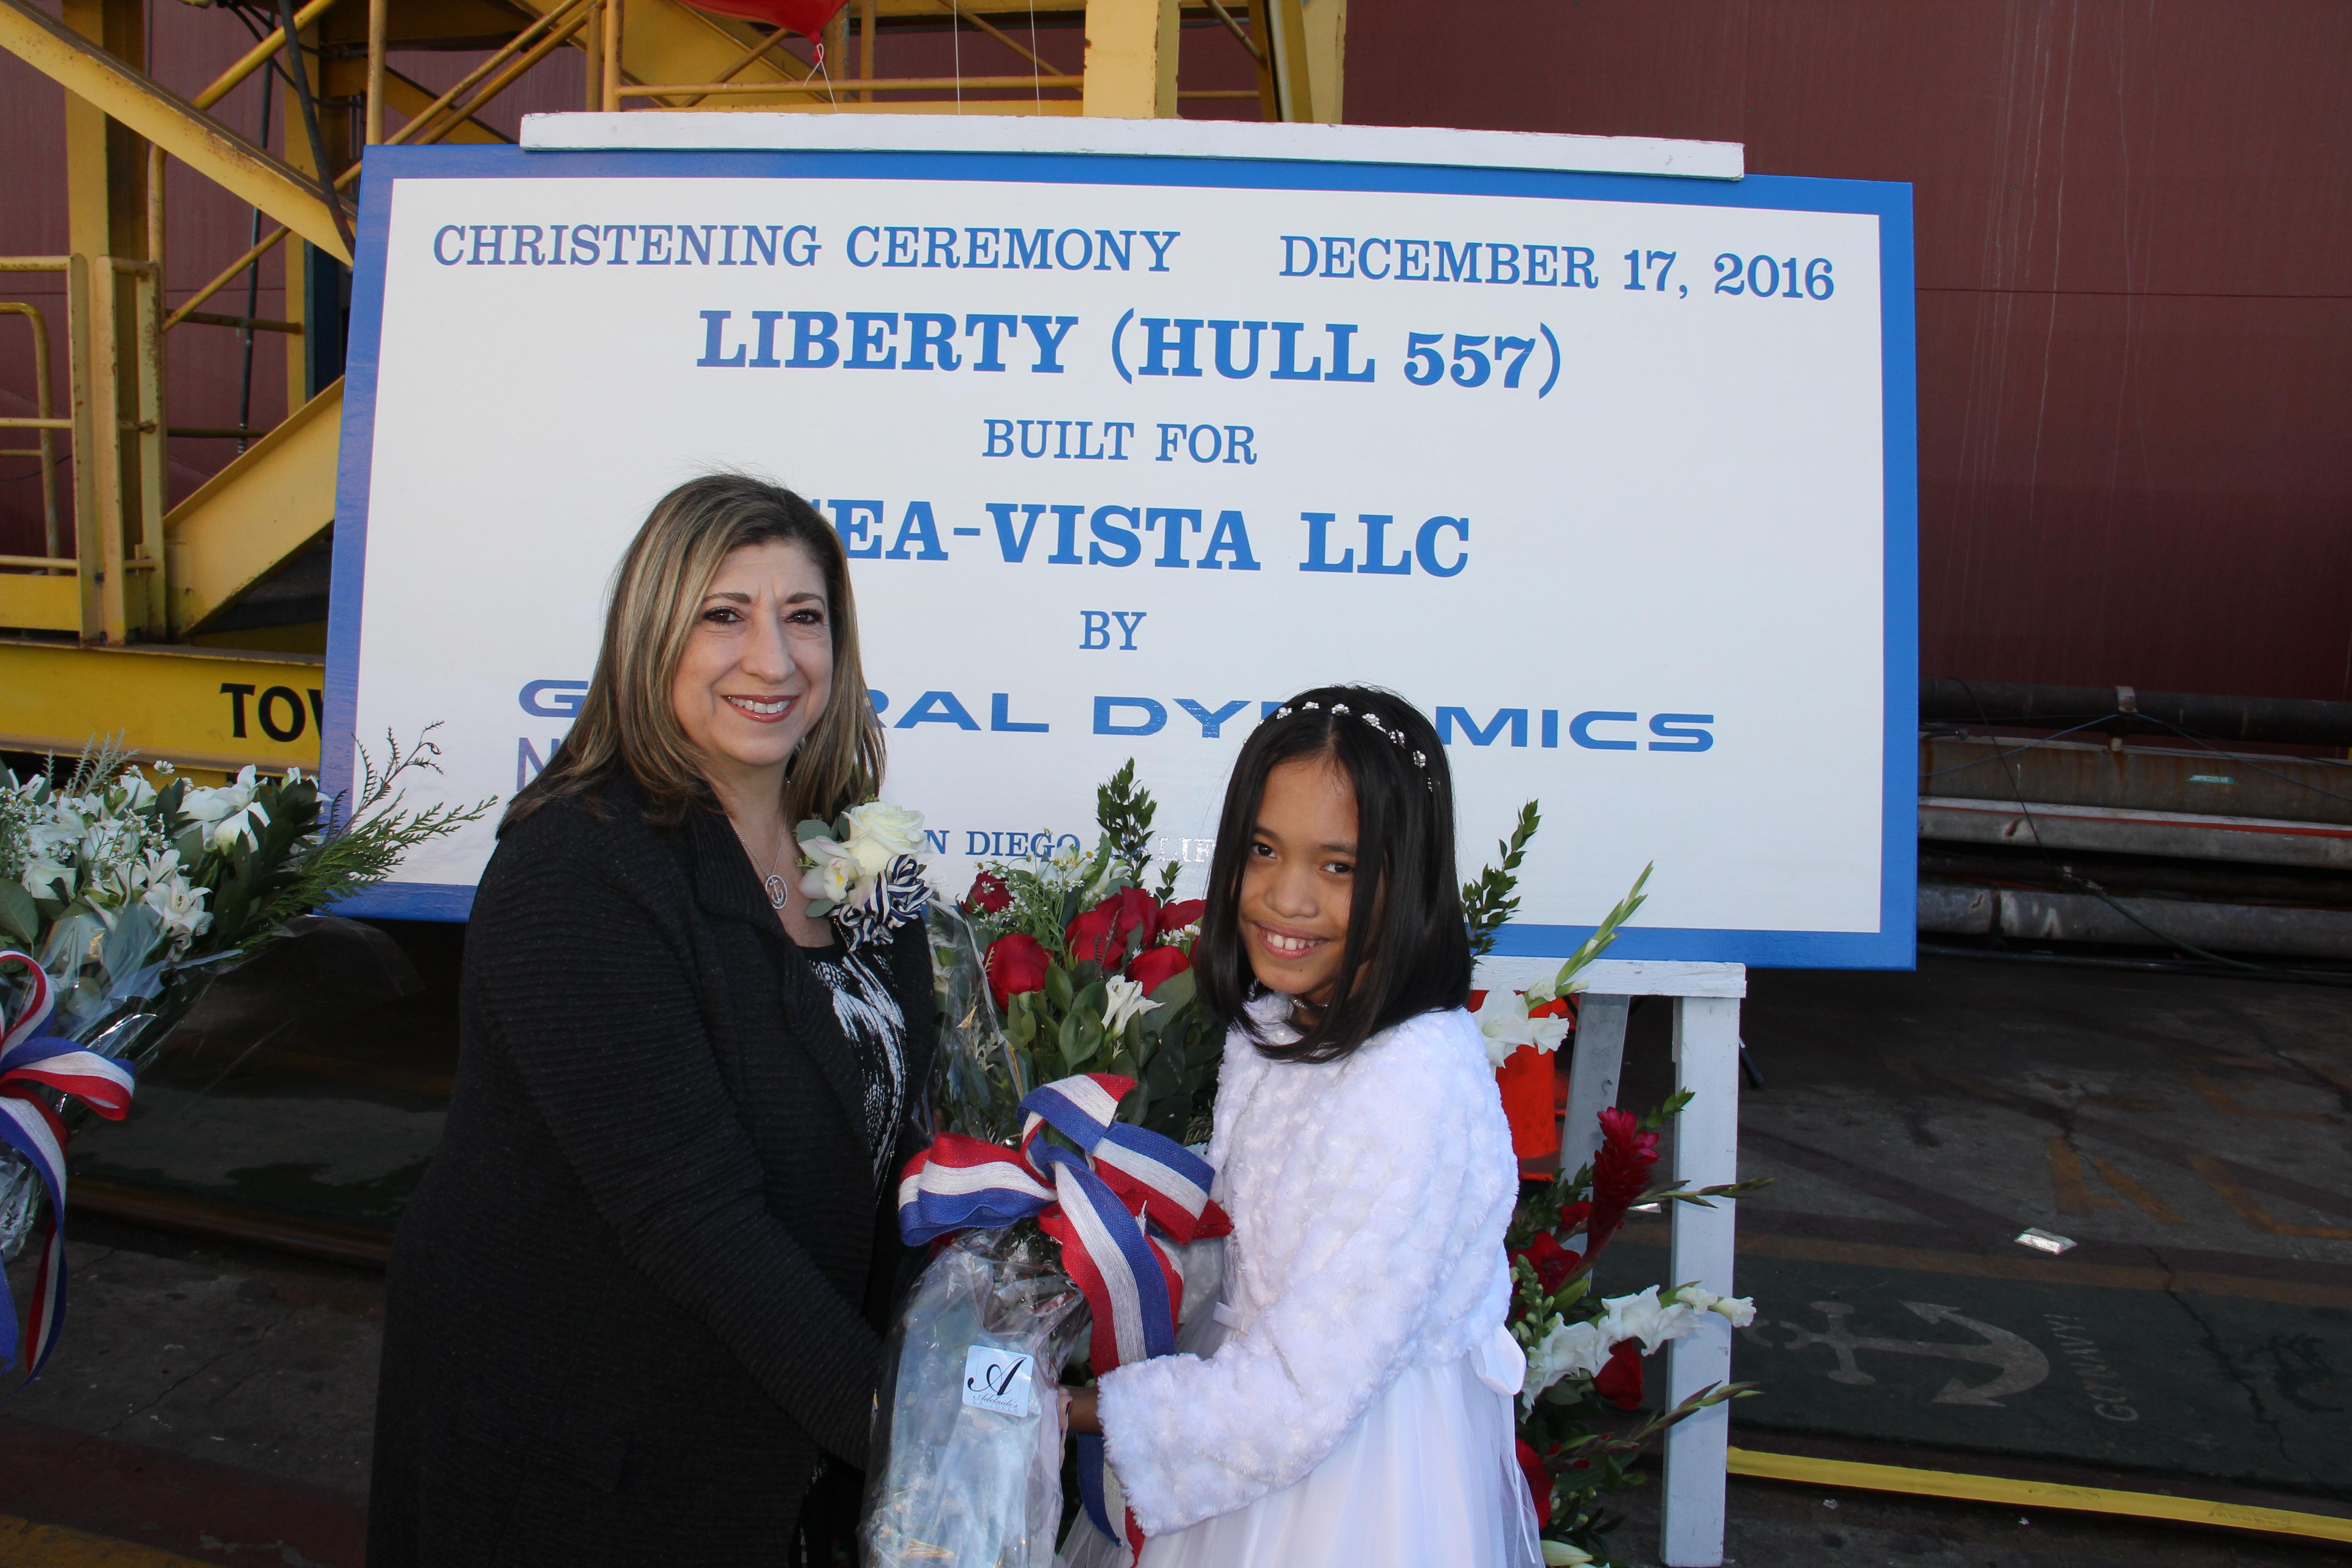 12-17-16 Liberty Hull 557 Christening (41)